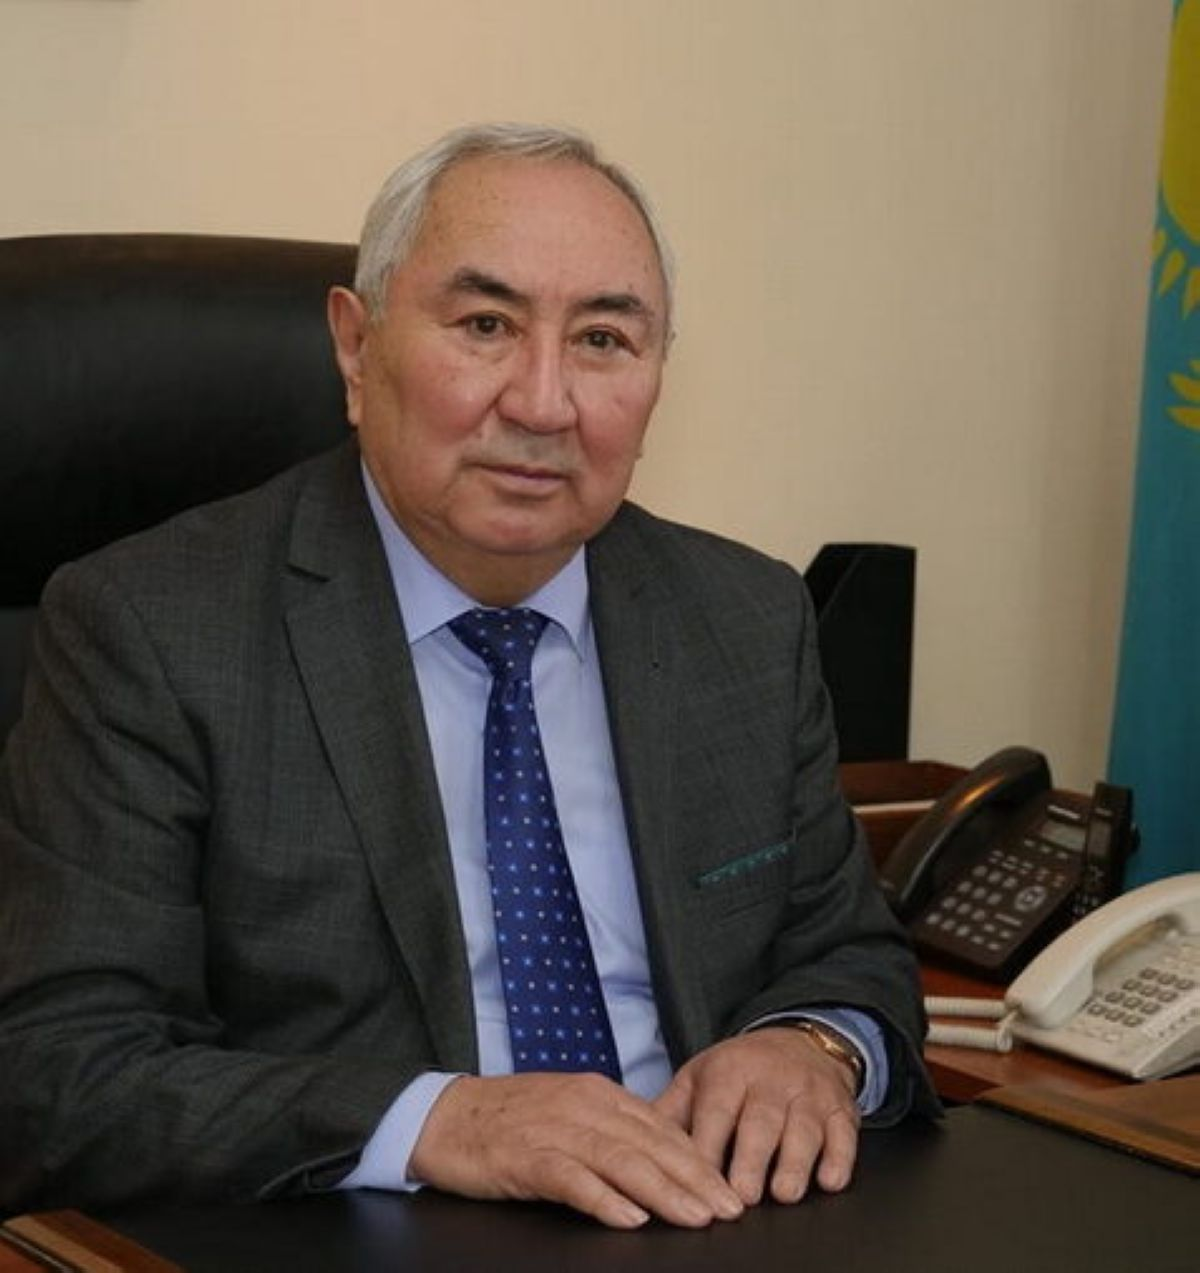 ZHiguli Dayrabaev e1626339396799